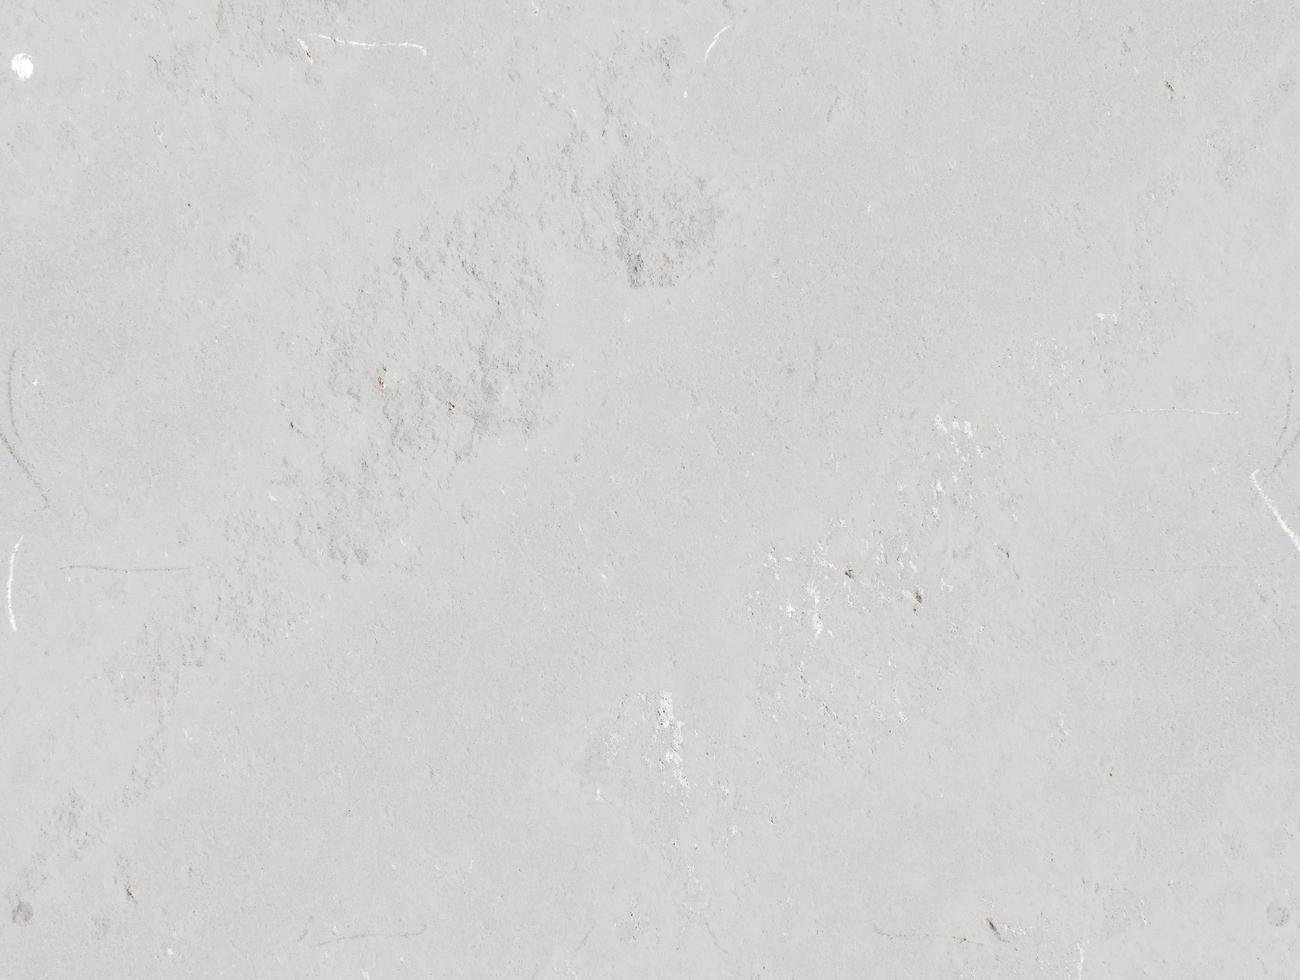 minimalistische Betonwandbeschaffenheit foto